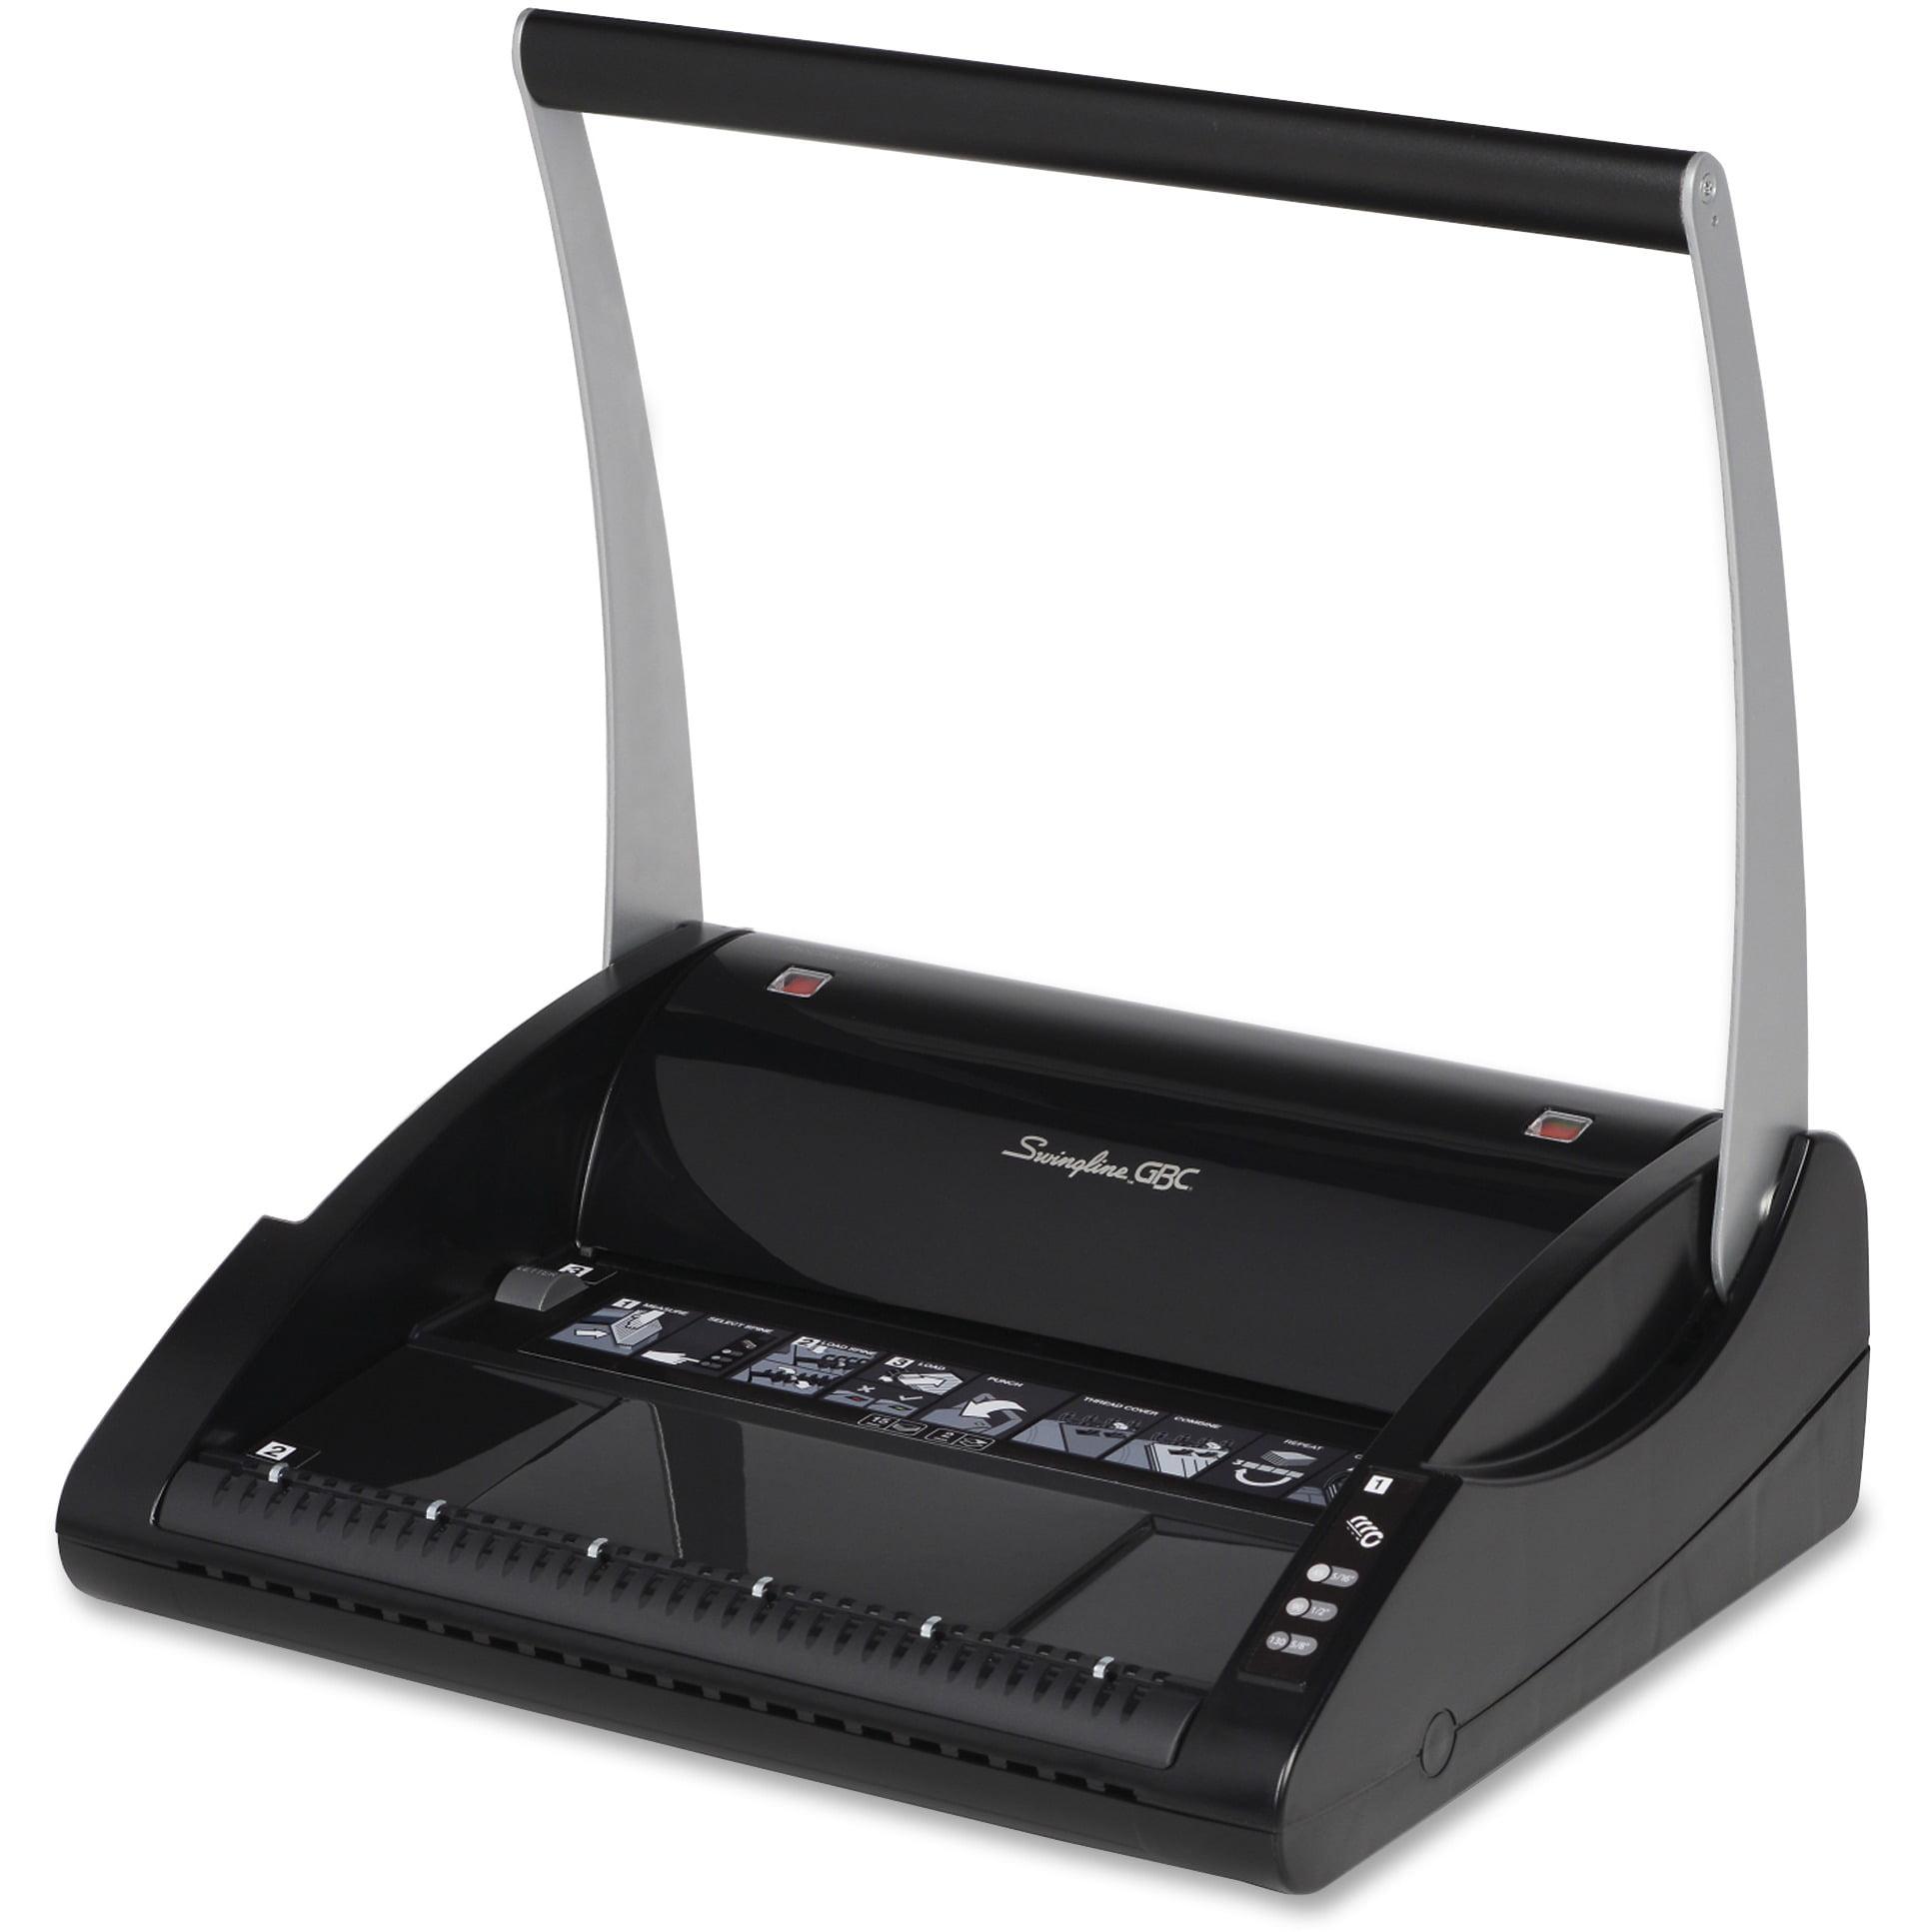 Swingline GBC, SWI7708185, ProClick Guide Right Manual Punch System, 1 Each, Gray